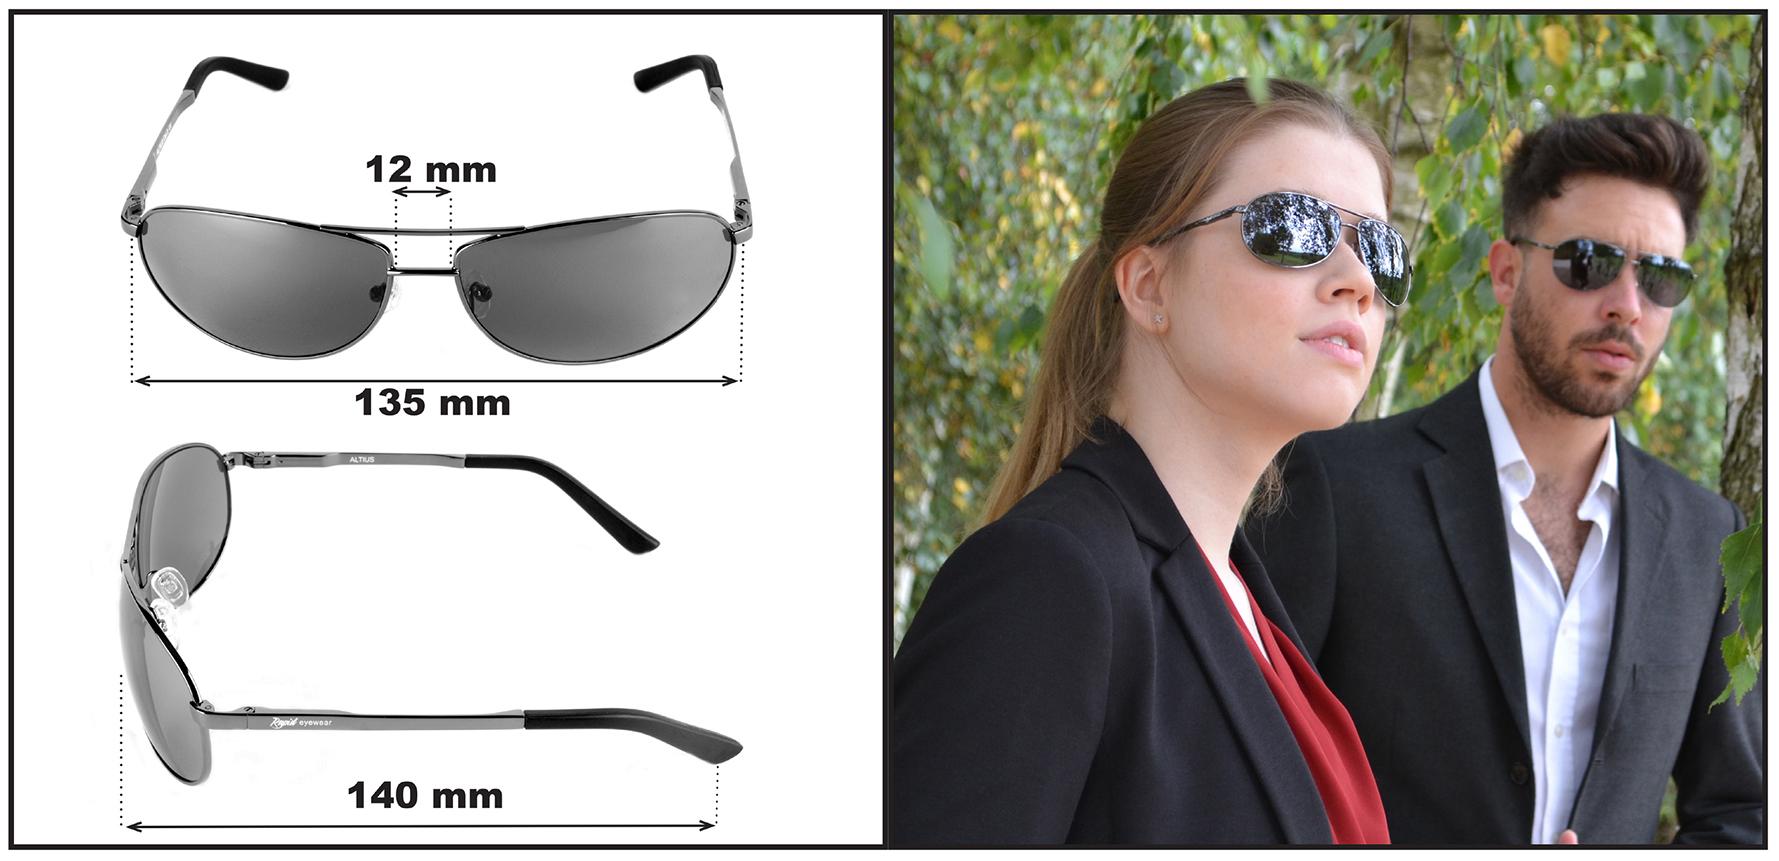 Bikerbrille - aviator style. Altius